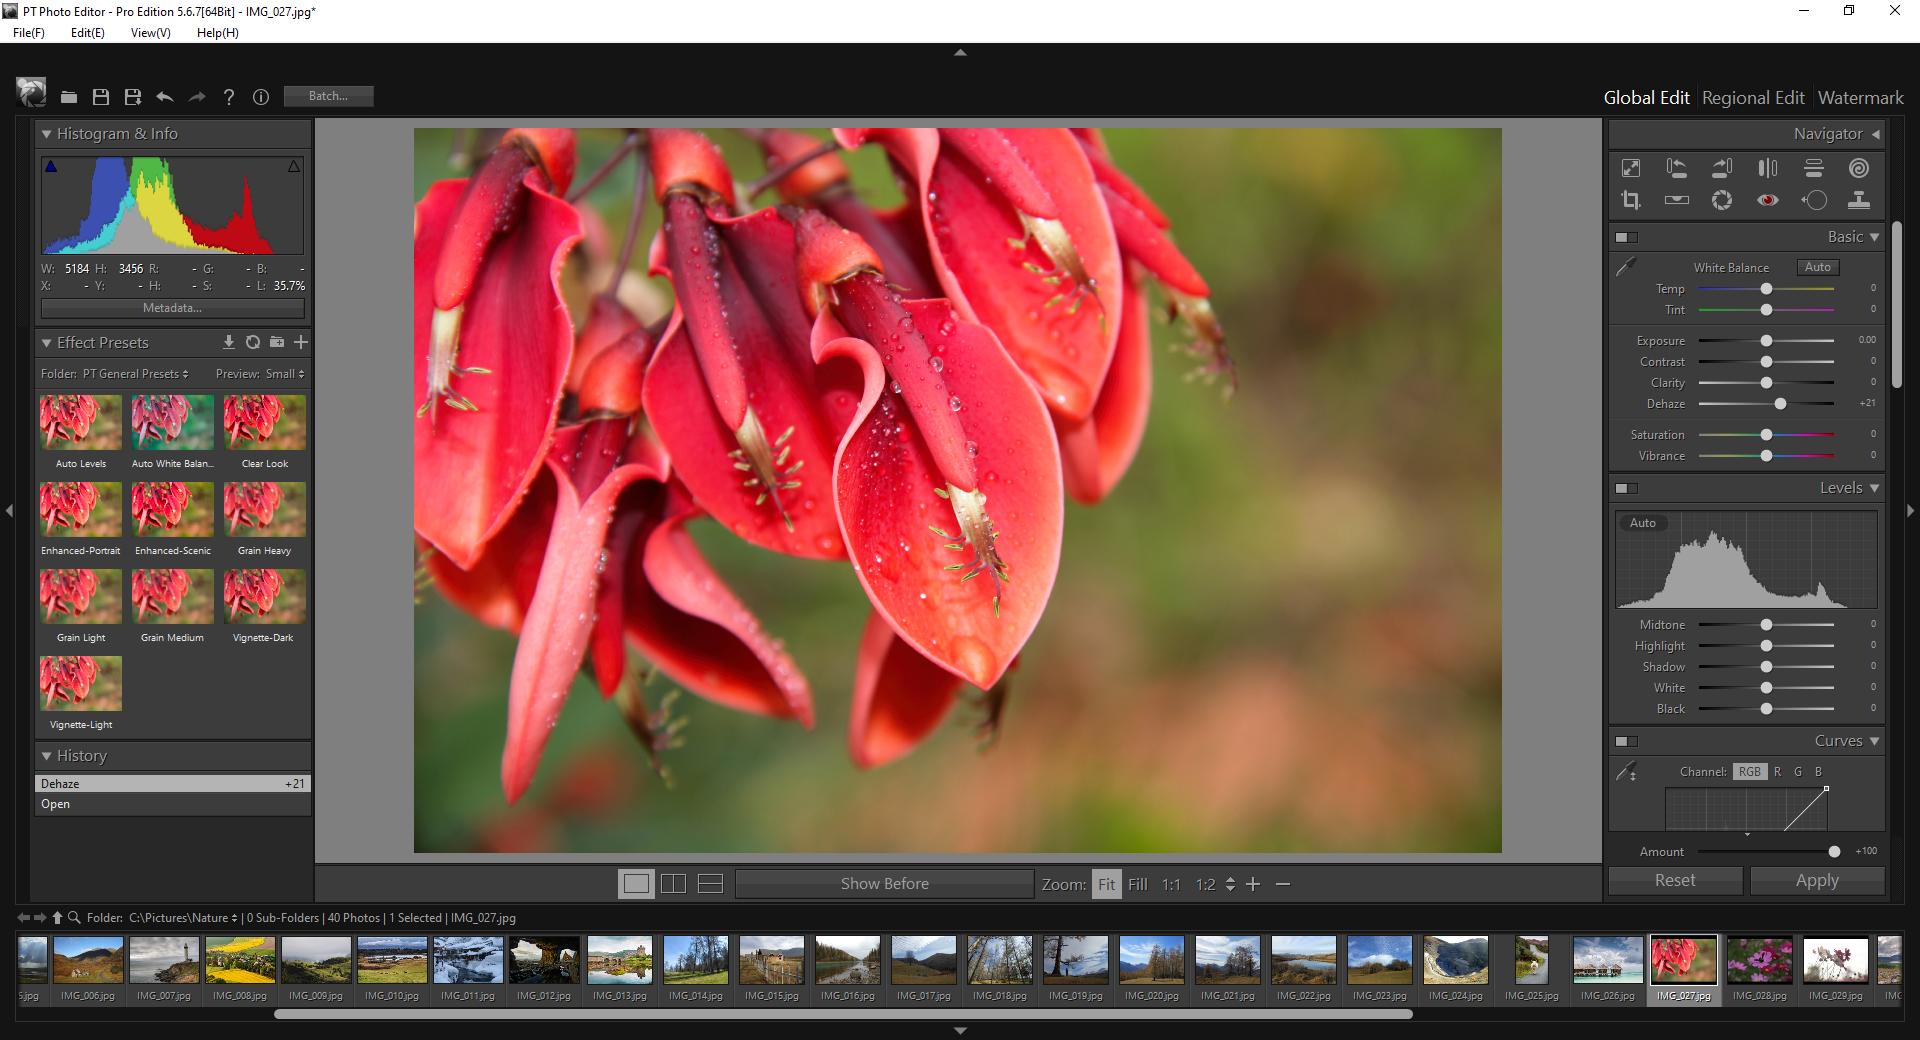 PT Photo Editor Screenshot